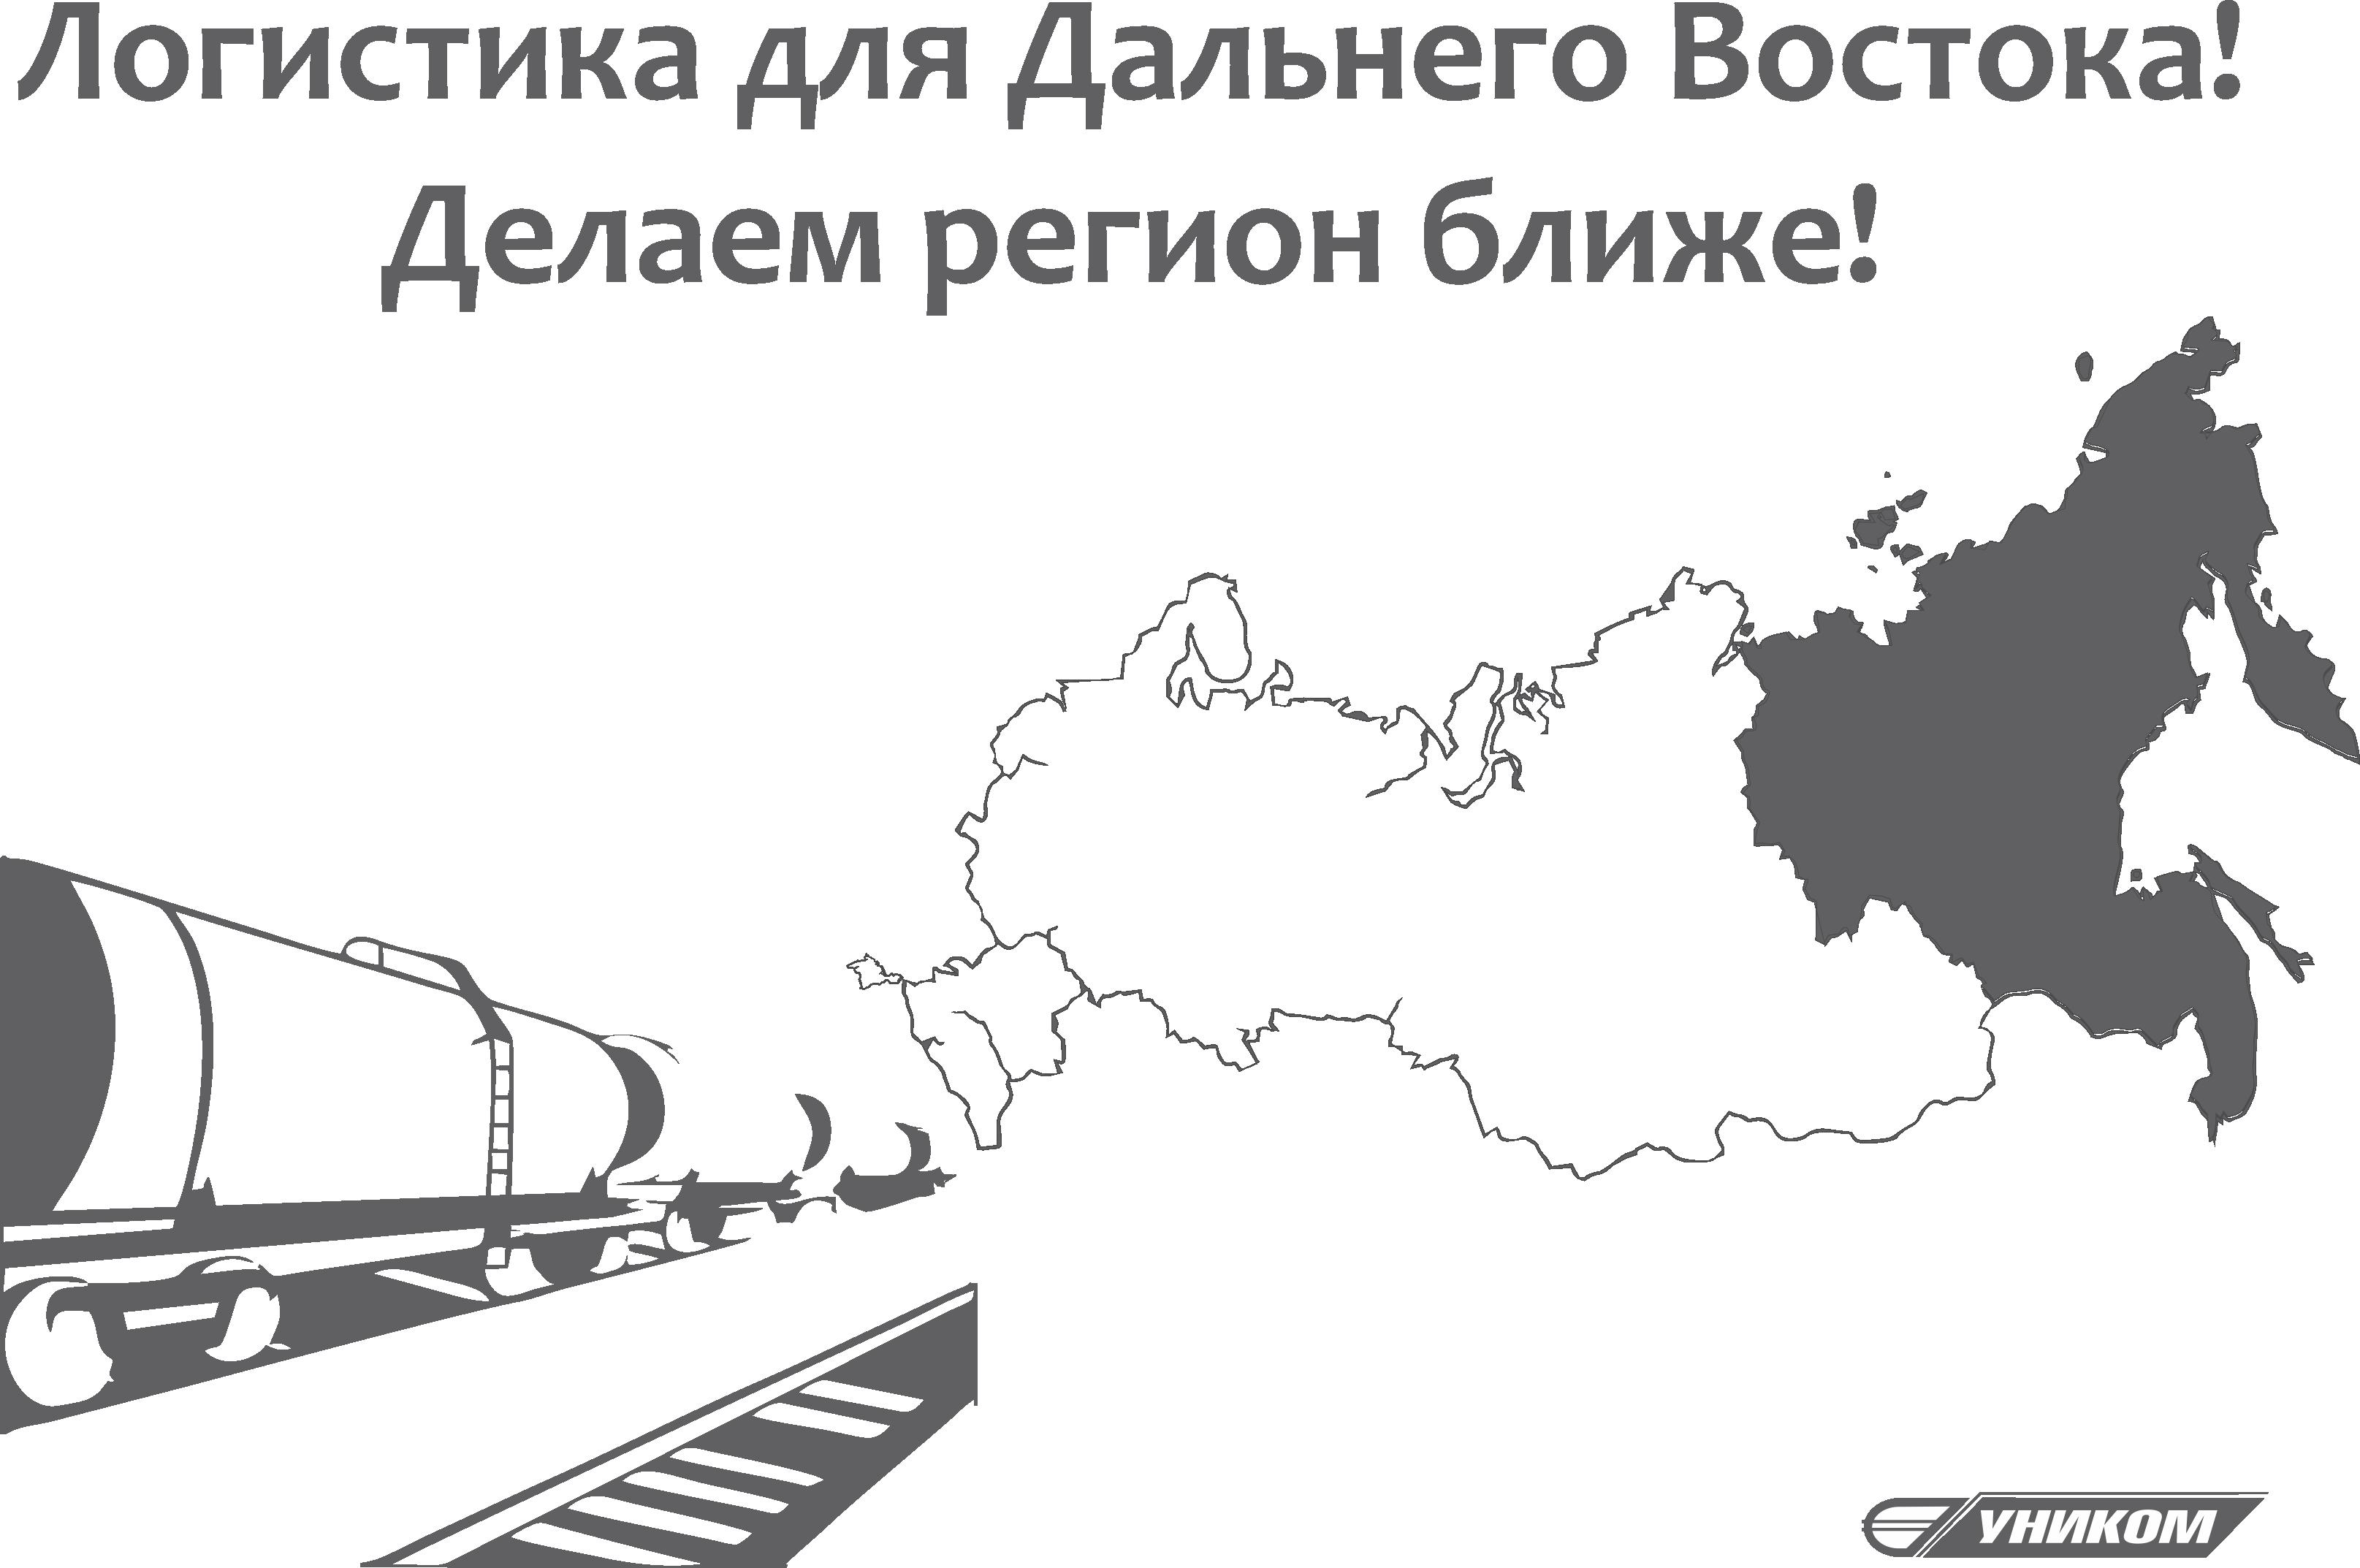 http://unikomlc.ru/wp-content/uploads/2019/02/Уником.png